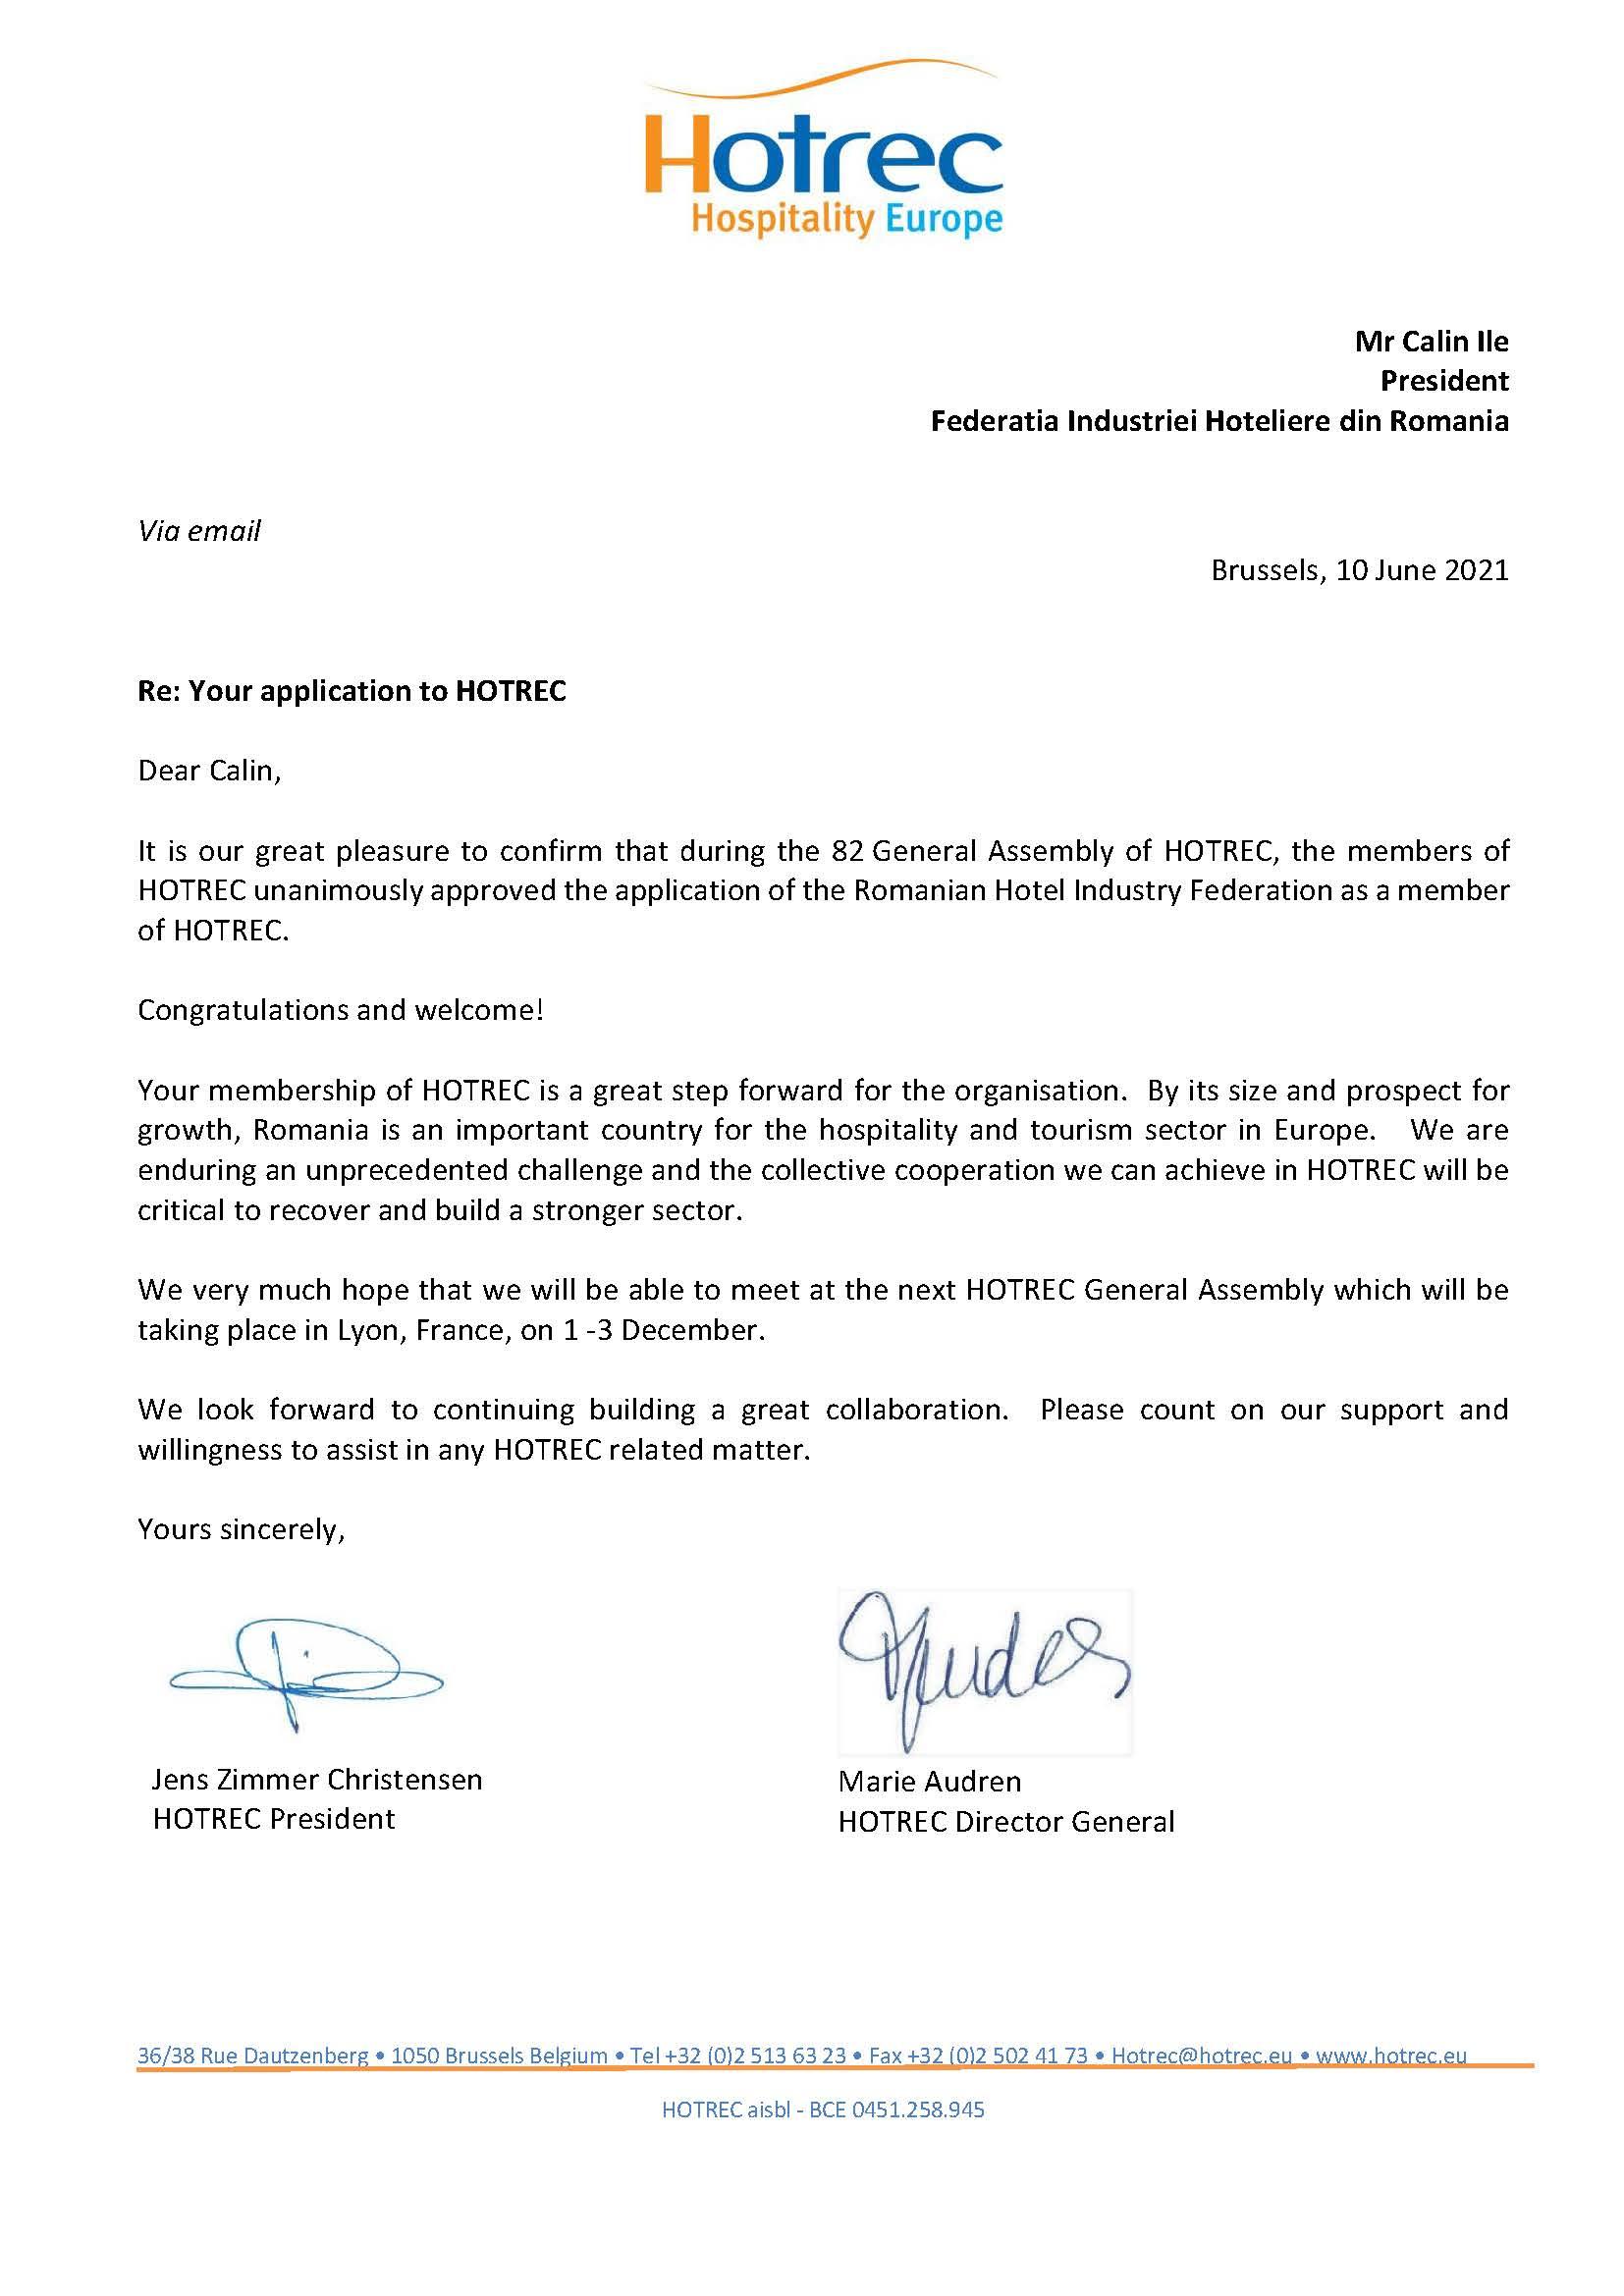 HOTREC Letter Application